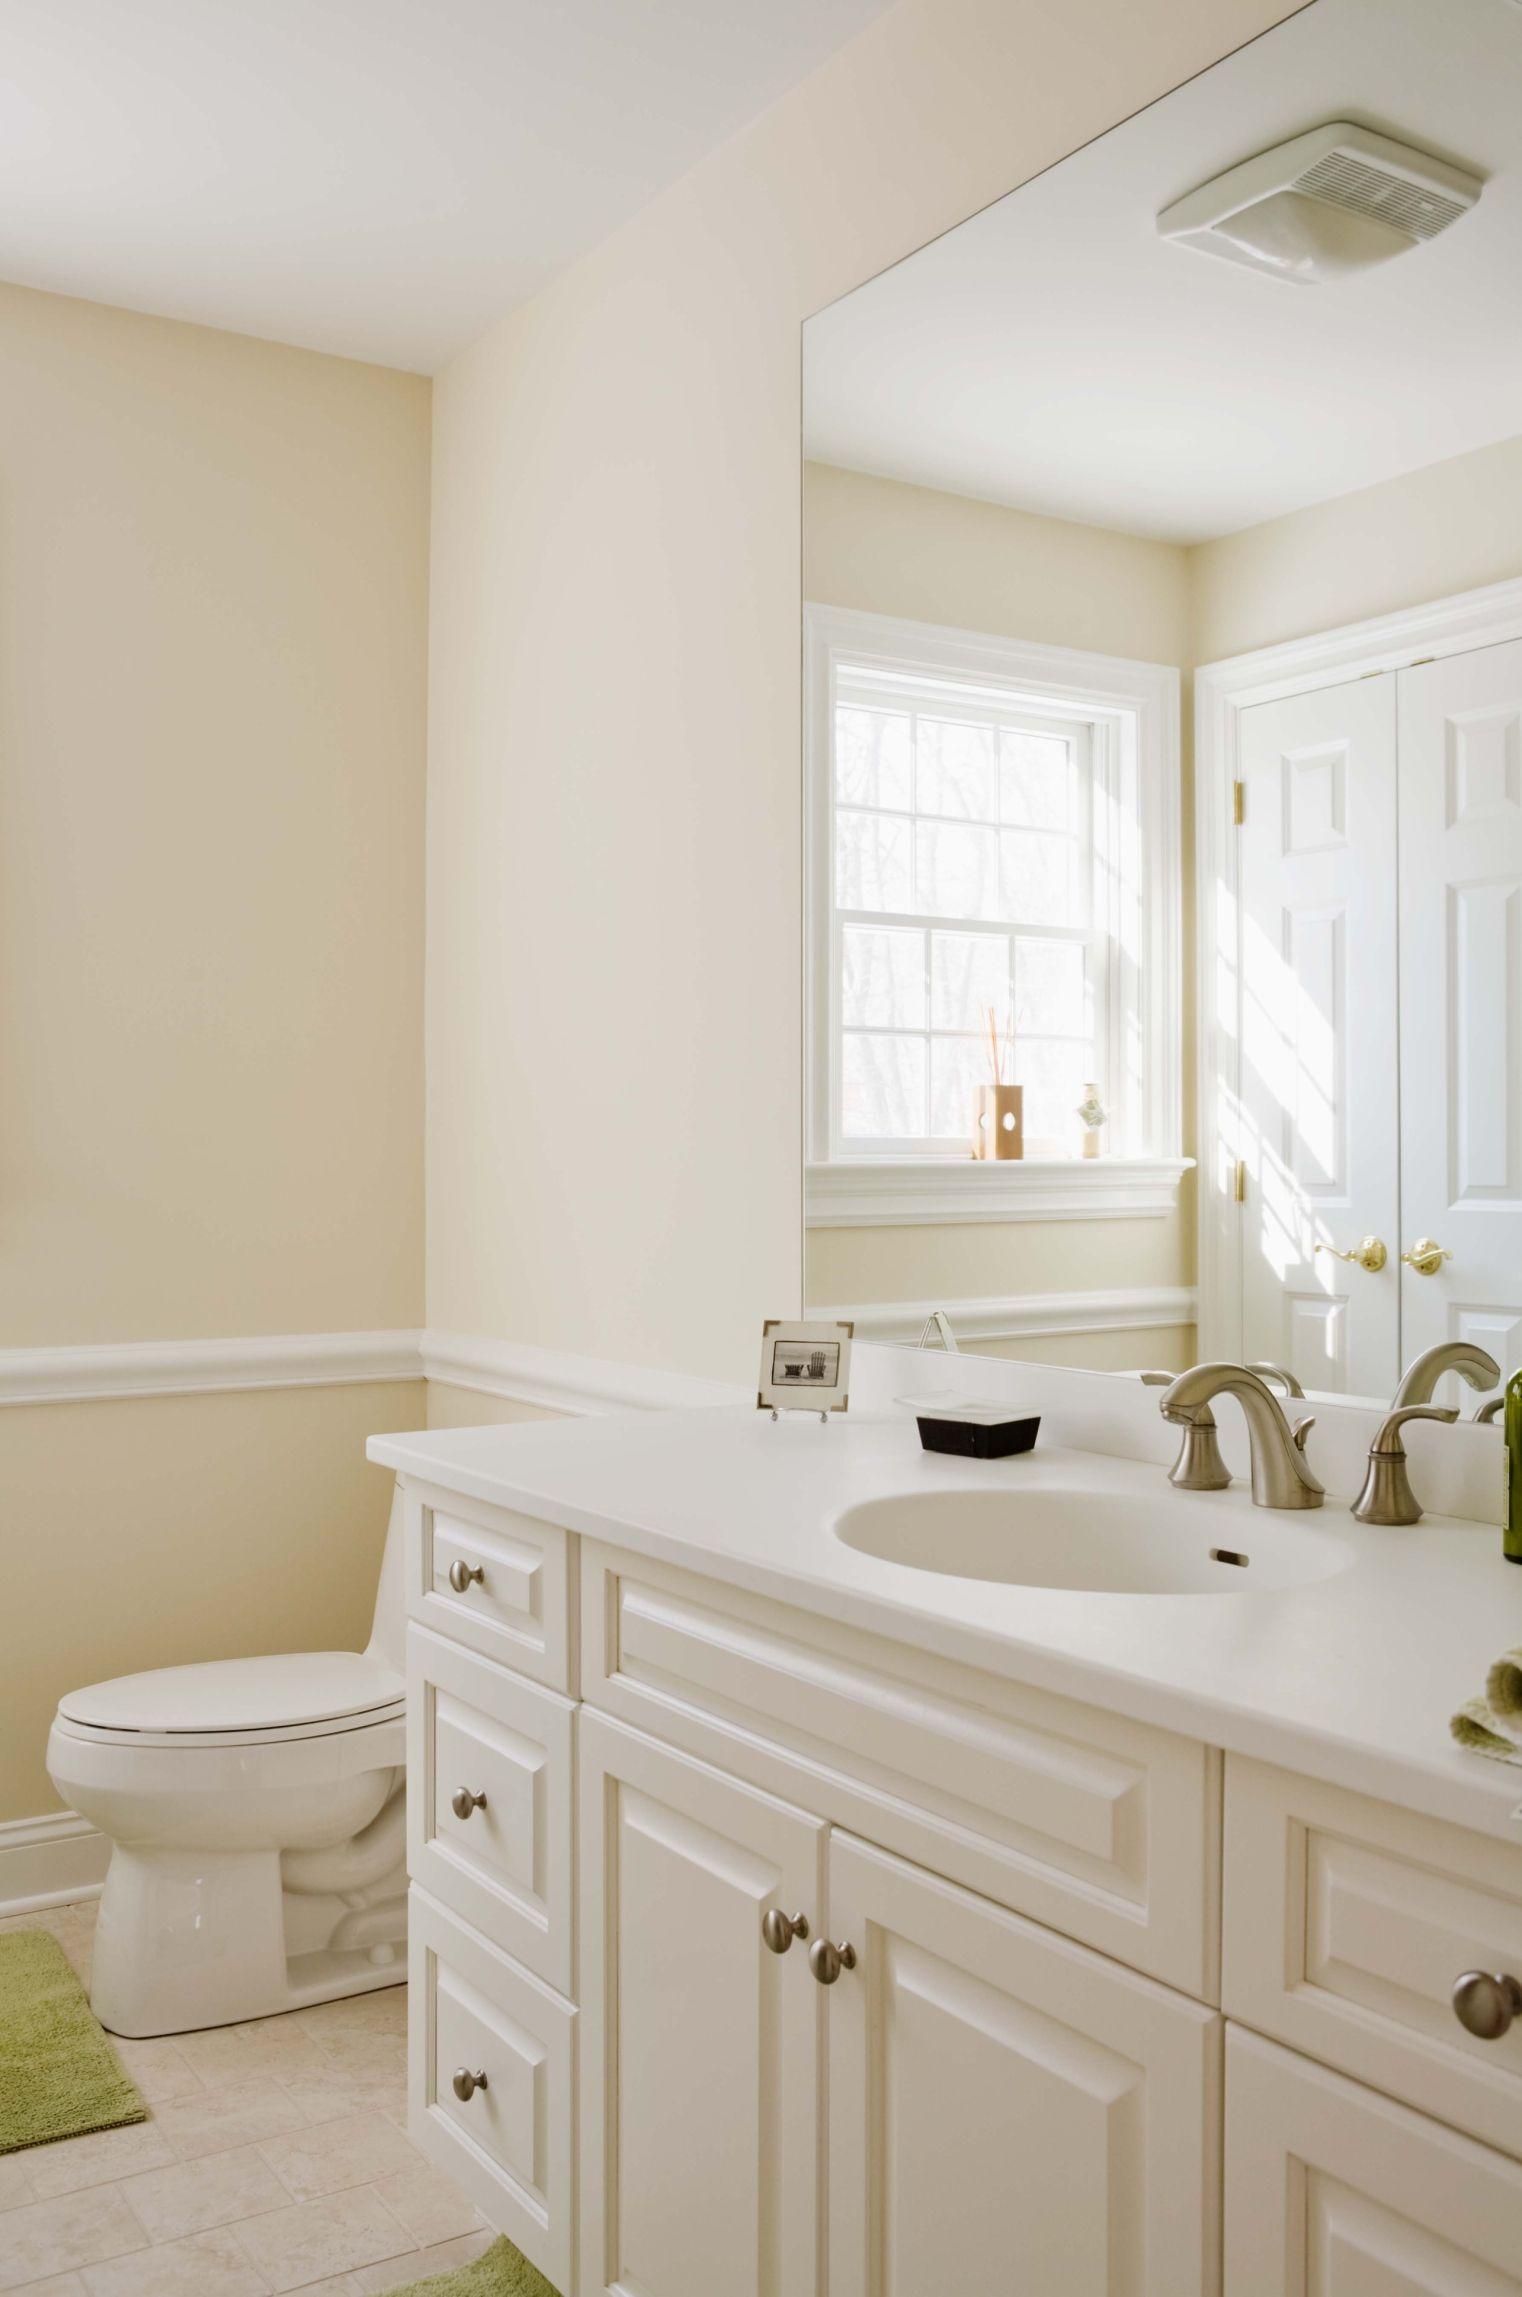 How To Fix Peeling Paint On The Bathroom Wall Ceiling Bathrooms Remodel Small Bathroom Remodel Trendy Bathroom